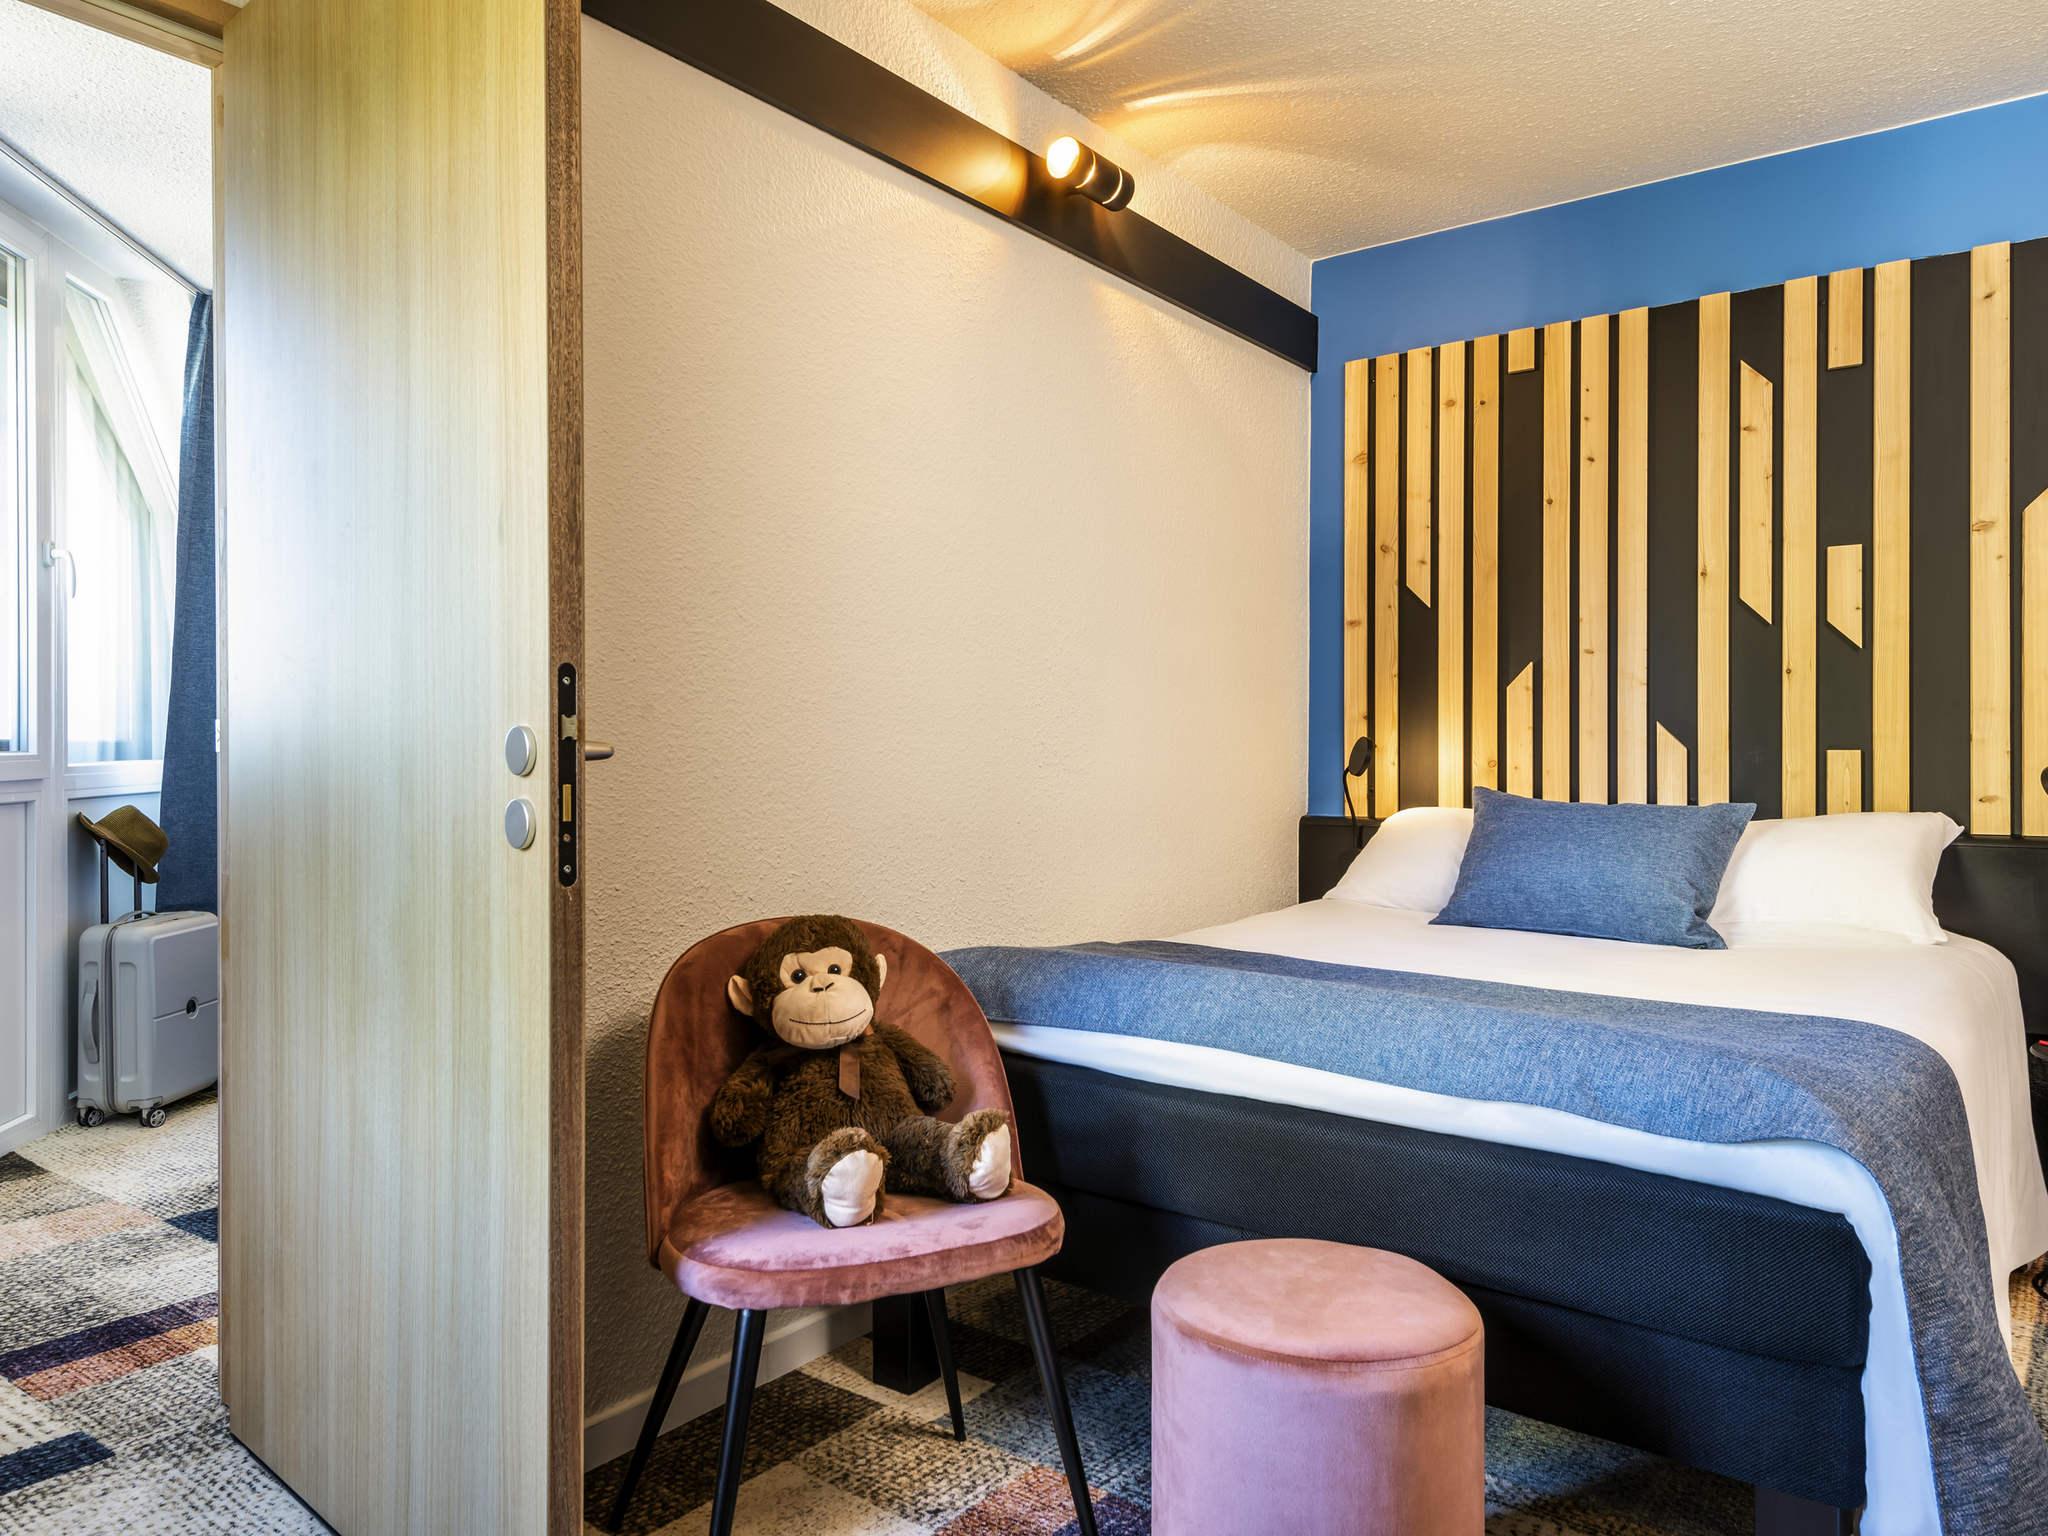 h tel boulogne sur mer ibis boulogne sur mer centre cath drale. Black Bedroom Furniture Sets. Home Design Ideas